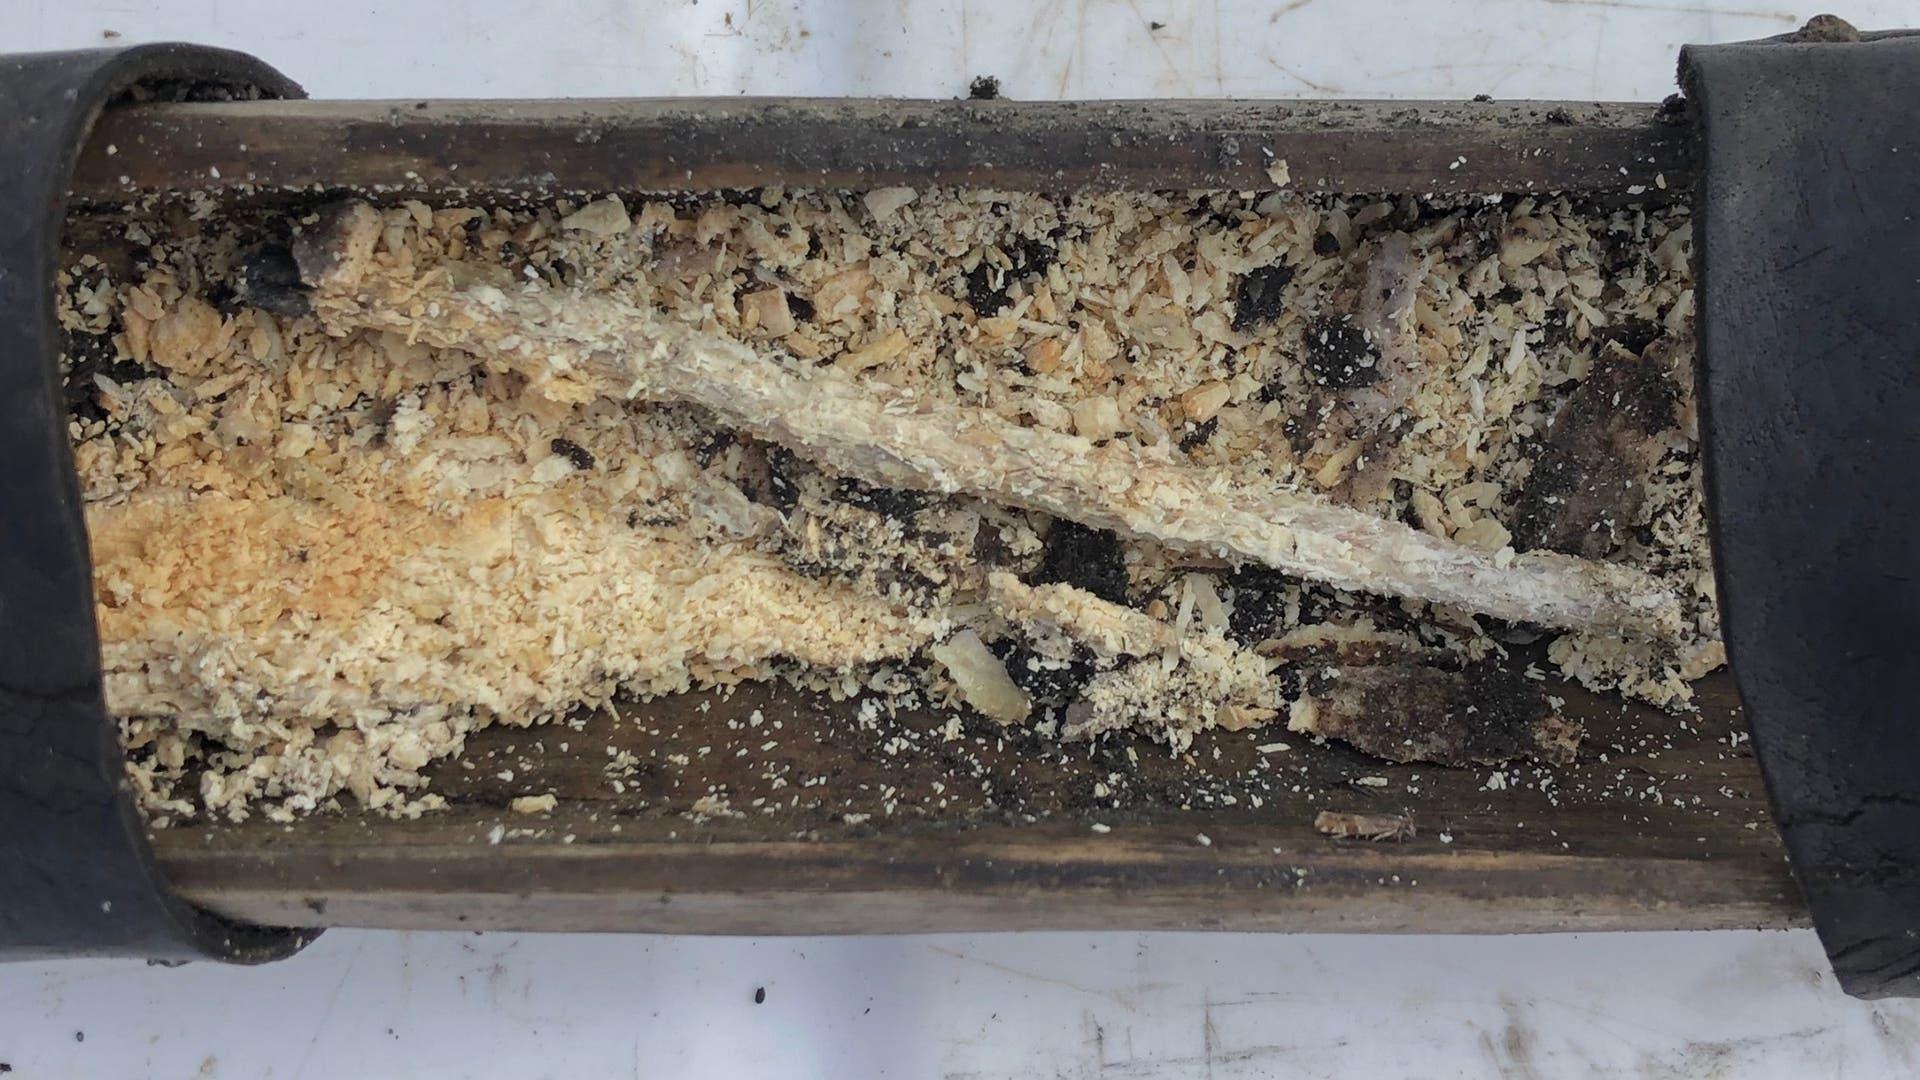 Holzkästchen aus dem Gletschereis